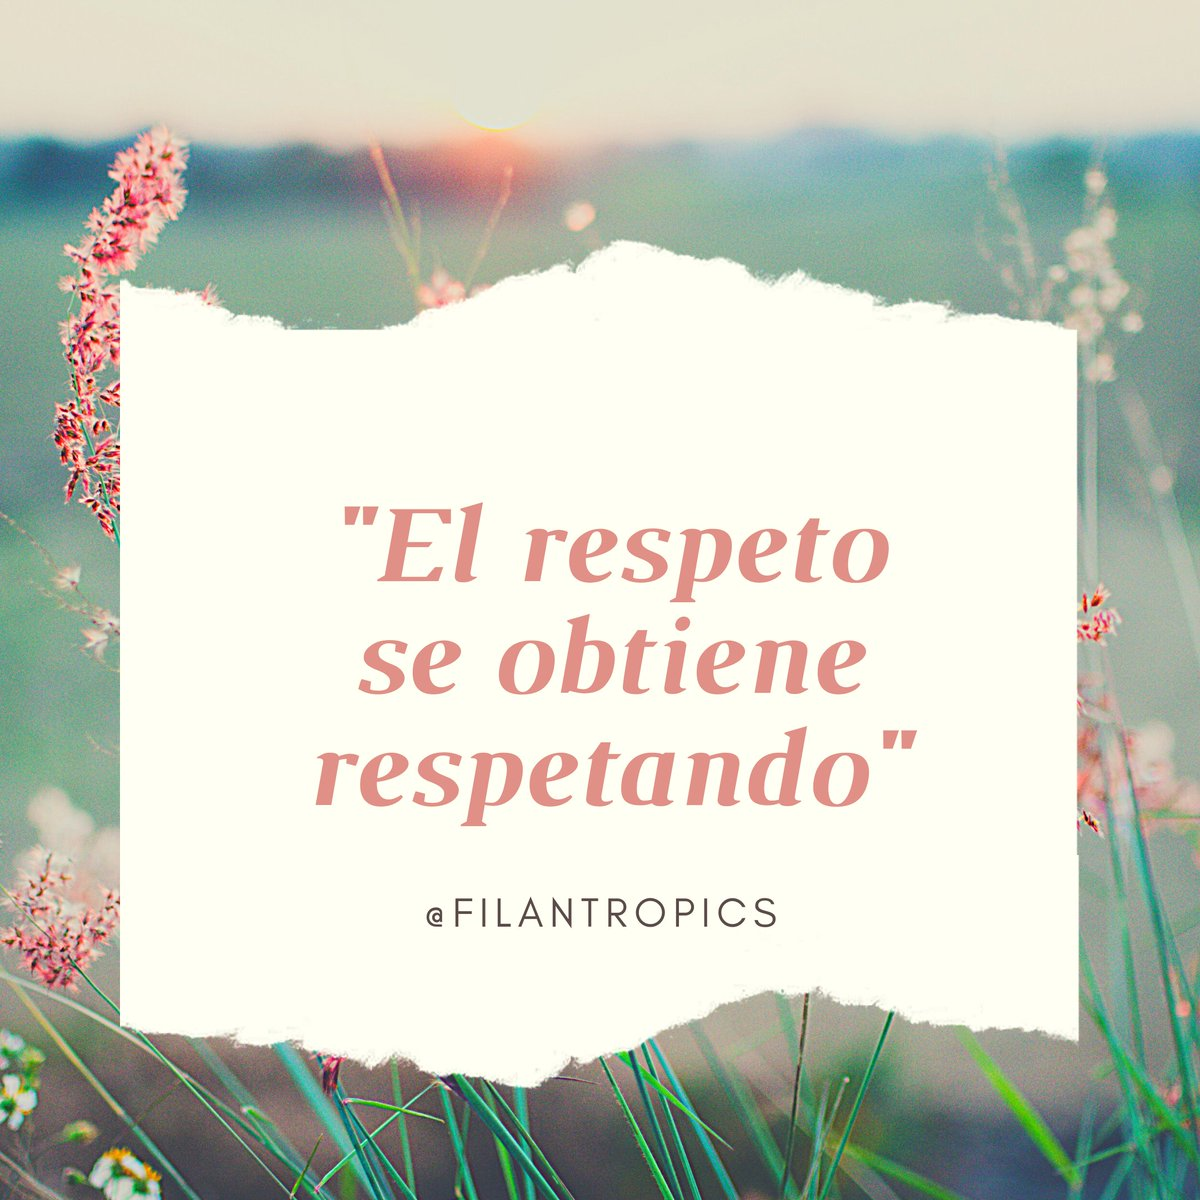 """𝑬𝒍 𝒓𝒆𝒔𝒑𝒆𝒕𝒐 𝒔𝒆 𝒐𝒃𝒕𝒊𝒆𝒏𝒆 𝒓𝒆𝒔𝒑𝒆𝒕𝒂𝒏𝒅𝒐"" 🌸 #respeto #motivacional #motivation #motivacion #leccionesdevida #psicologies #psicologia #lifestyle #photooftheday"